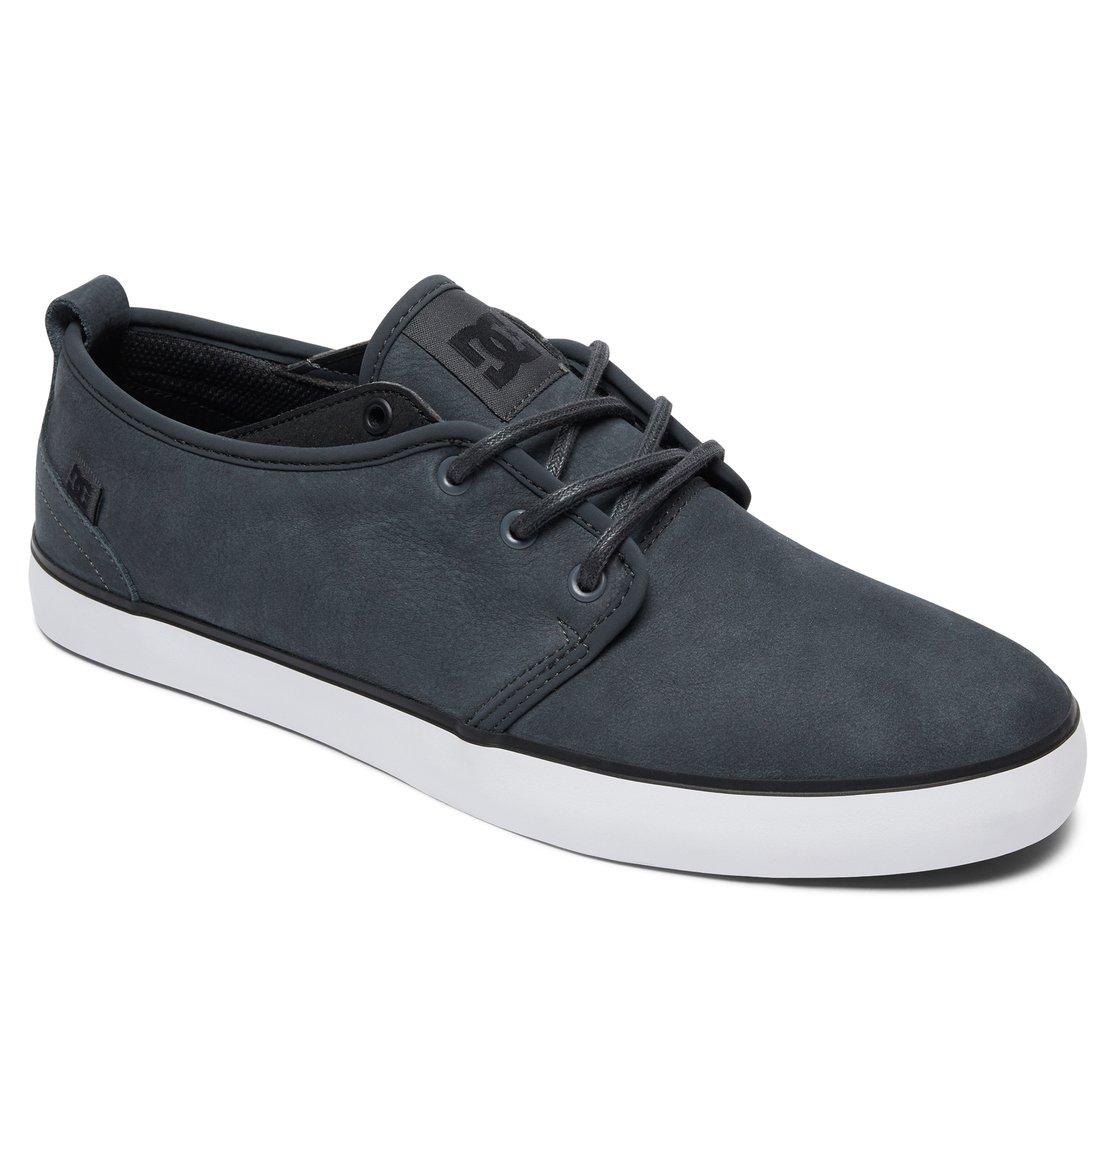 DC Shoes - Studio 2 LE - Baskets o3X8Xsl4